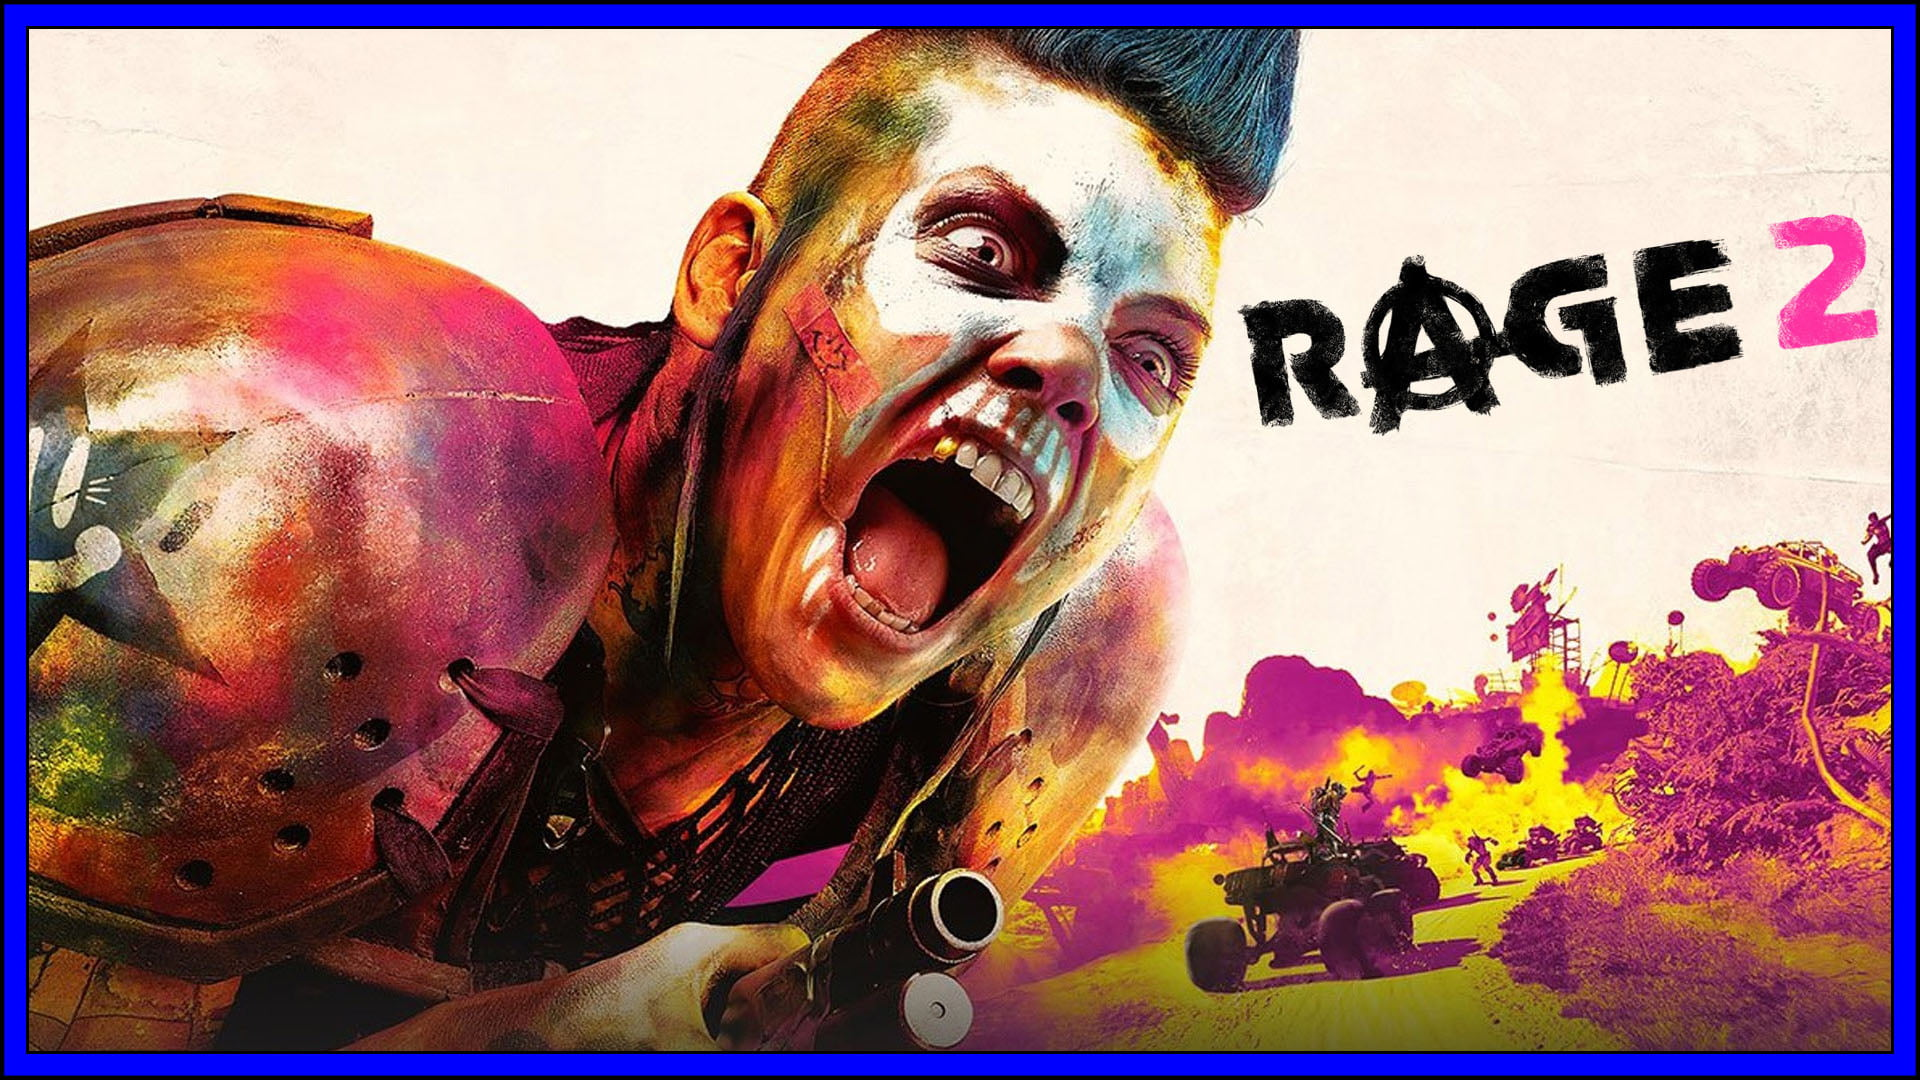 Rage 2 Fi3